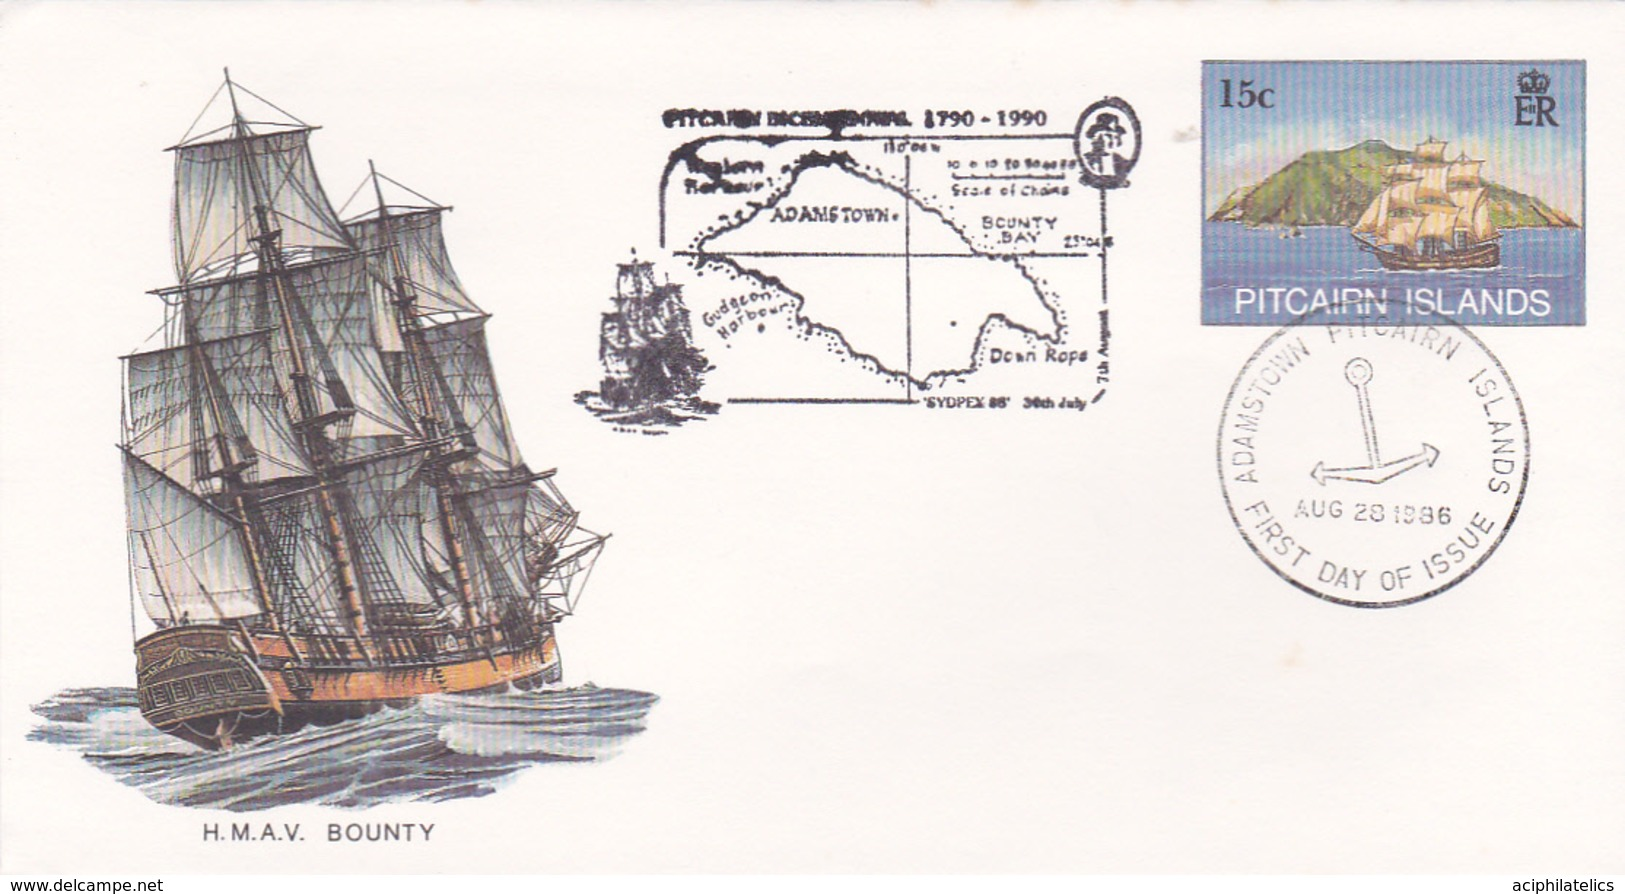 Pitcairn Islands 1986 HMAV Bounty, Souvenir Cover - Stamps